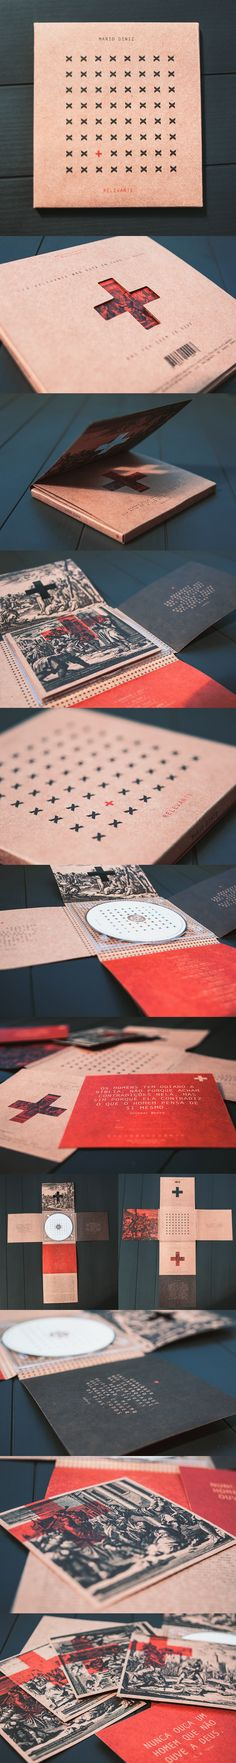 Manon 70 1968 jean aurel cd pinterest for Design vip chambre mario jean